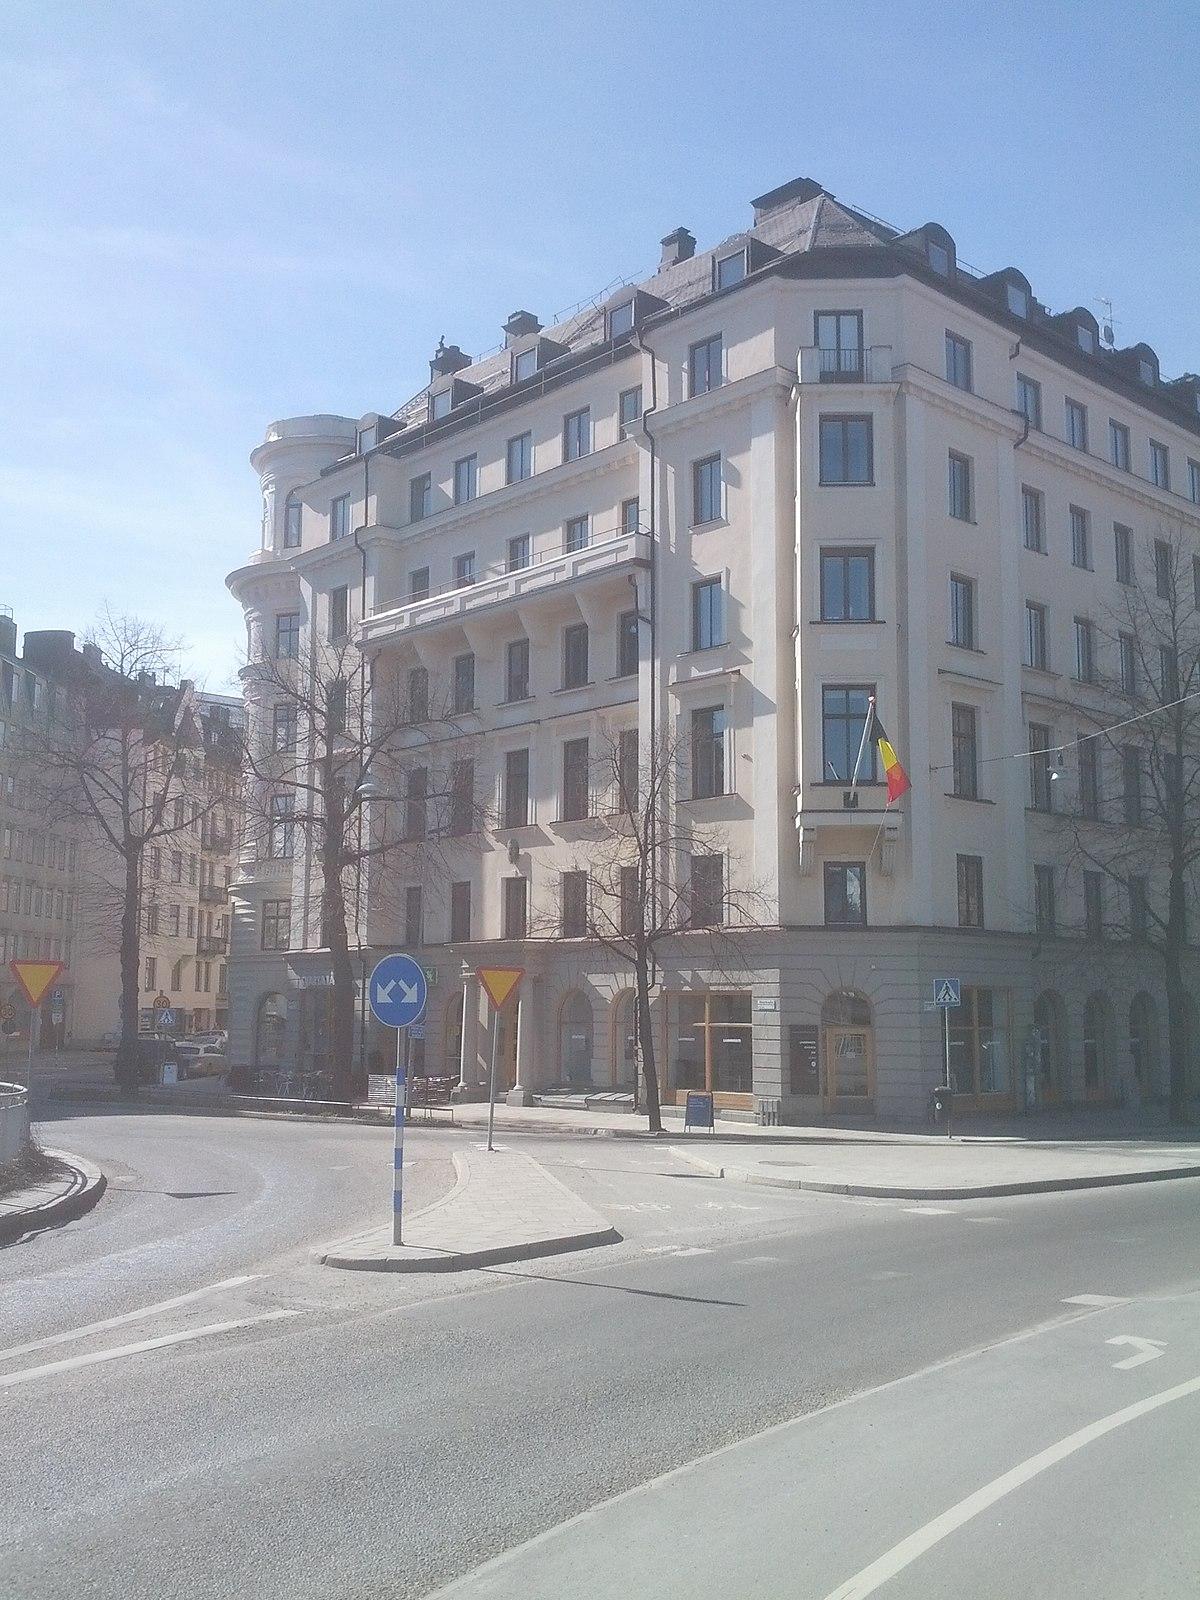 stockholm ambassad